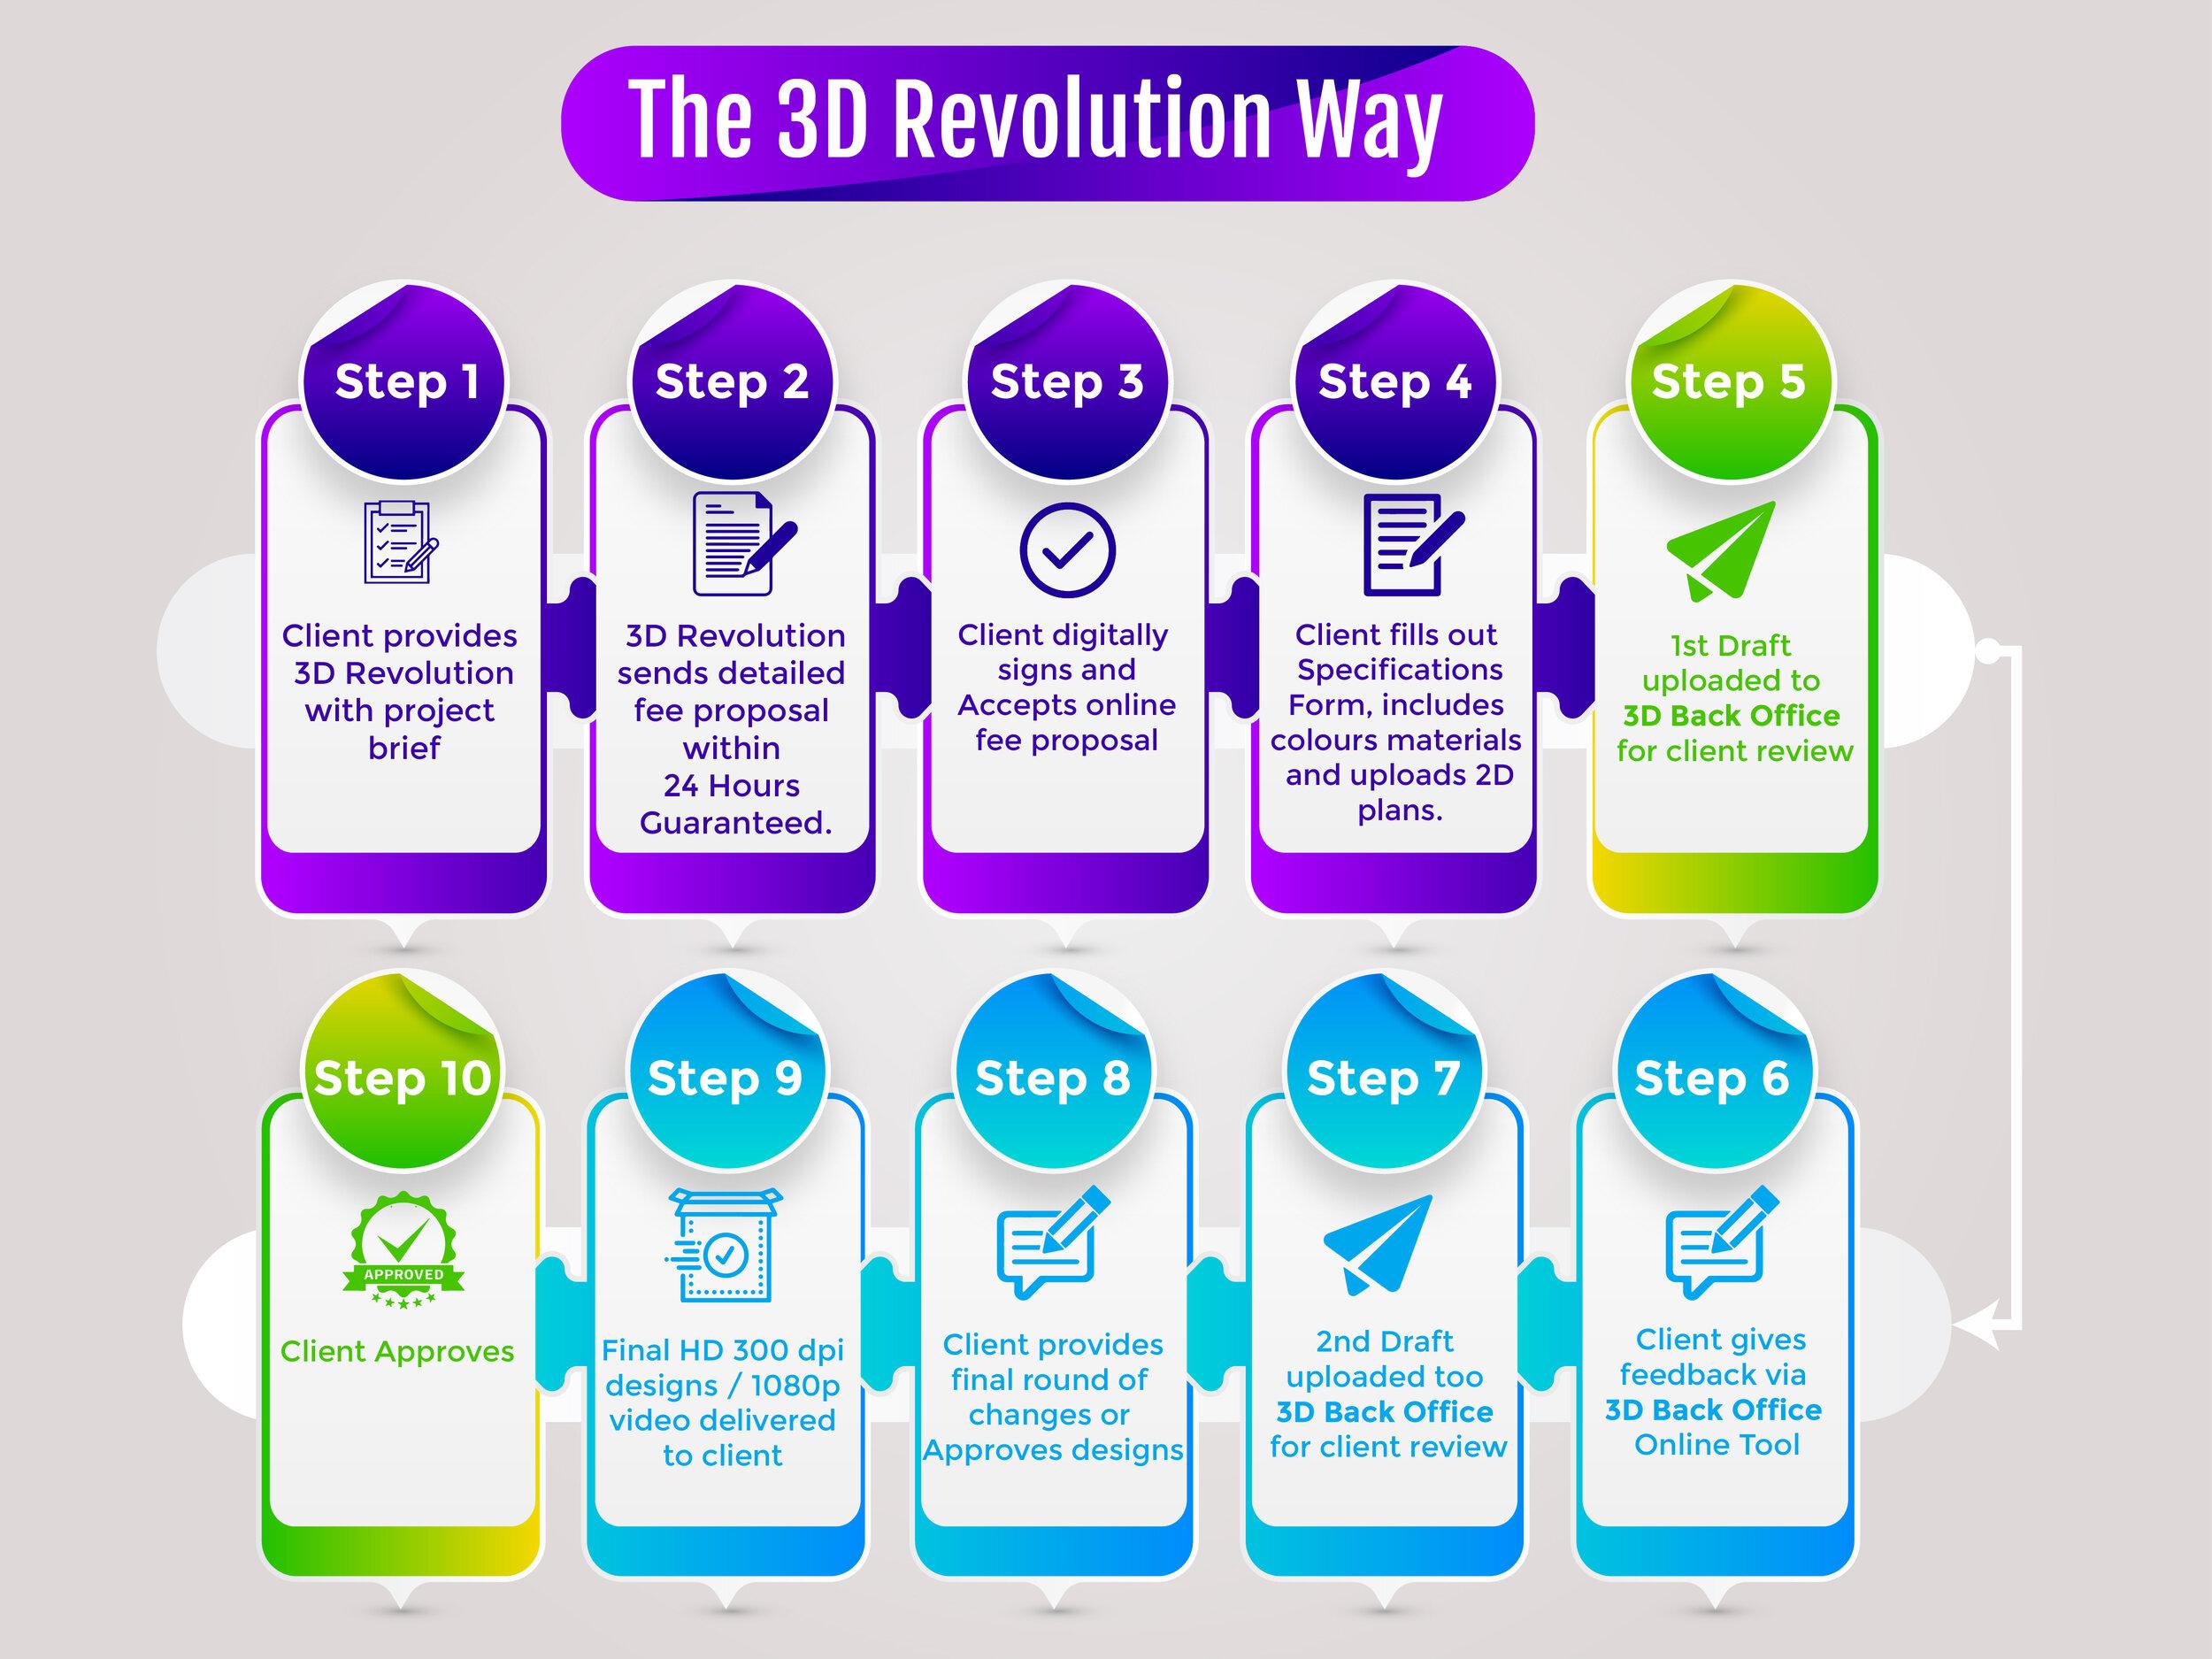 The 3D Revolution Way Process